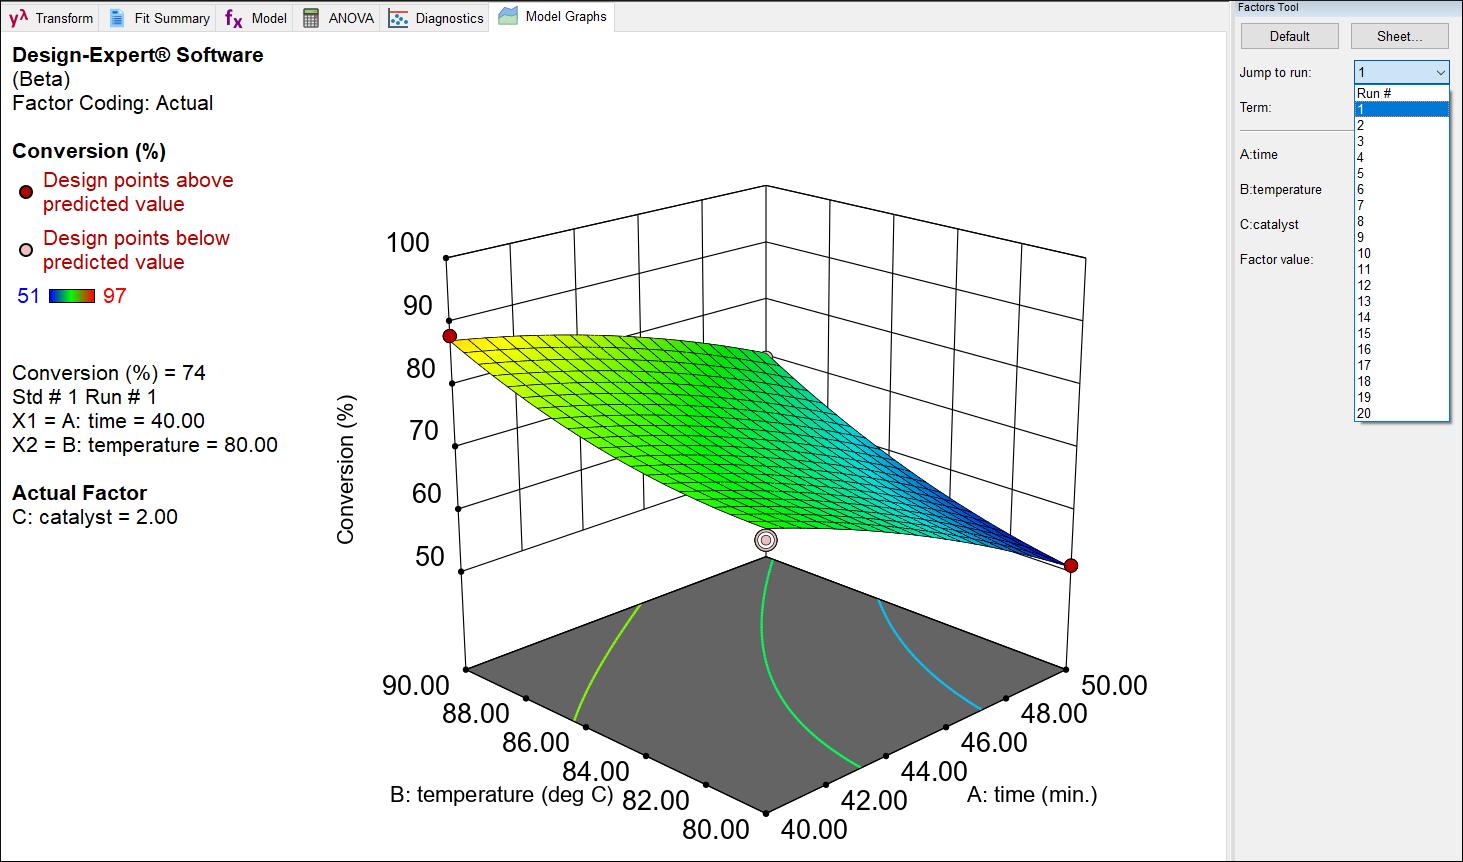 ../../_images/multifactor-rsm-3-9.PNG